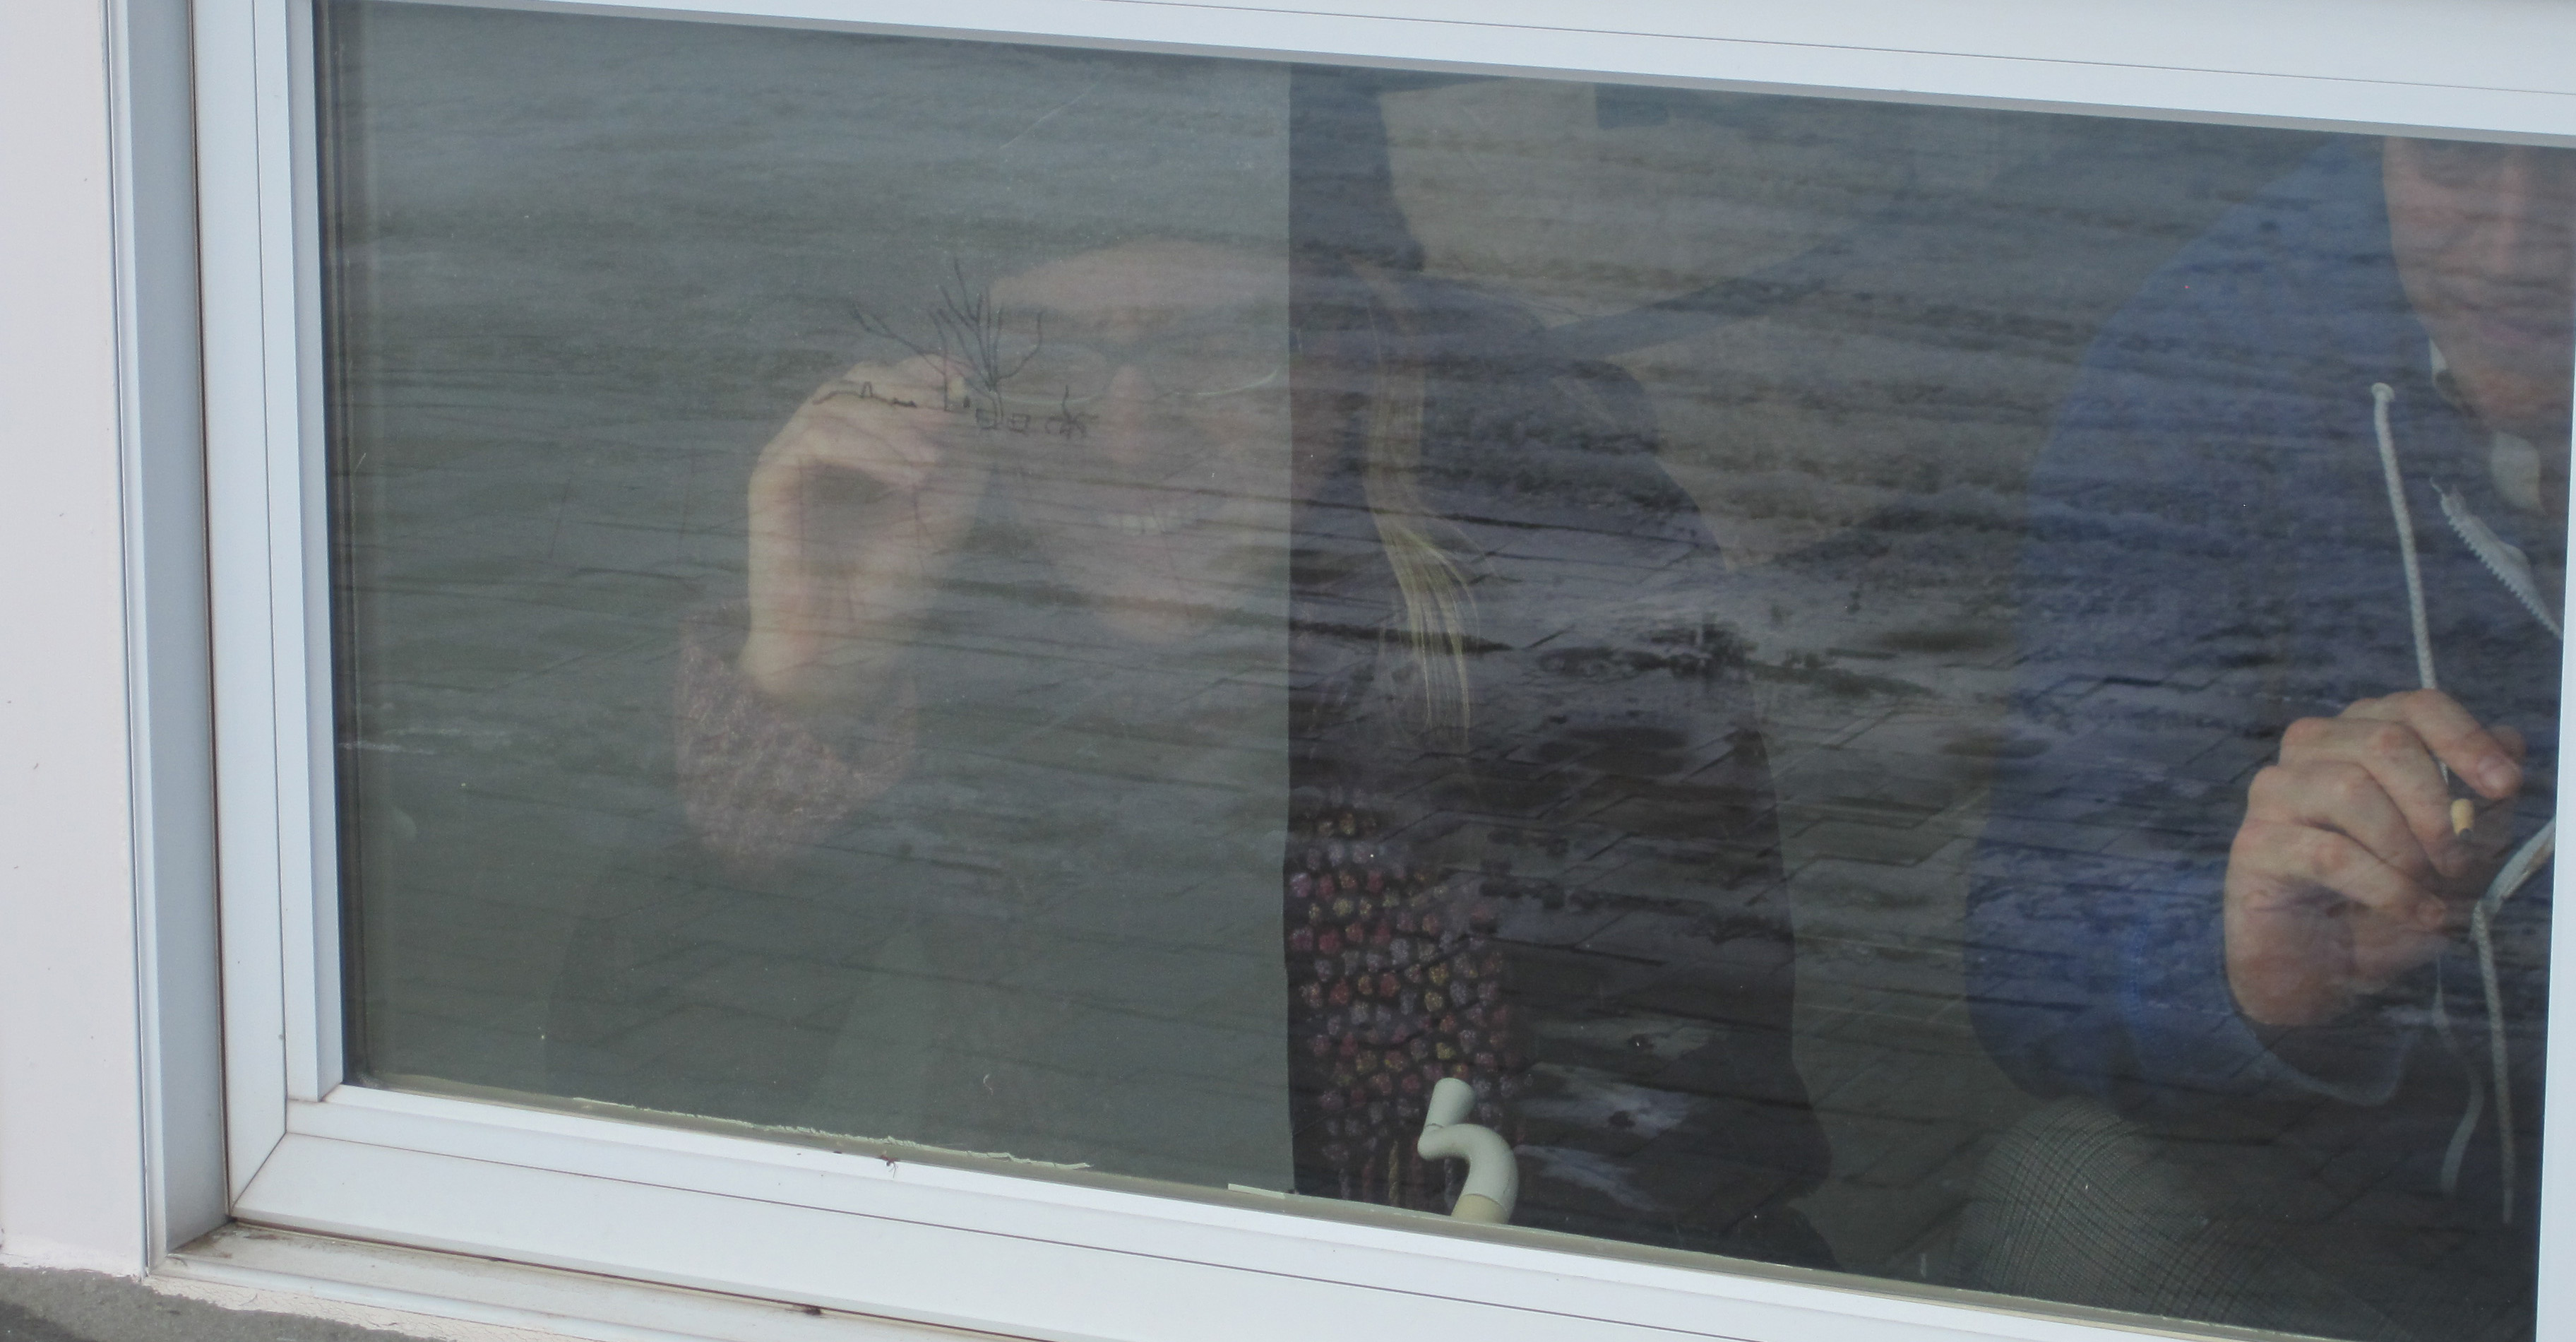 surfacing, people drawing lower window